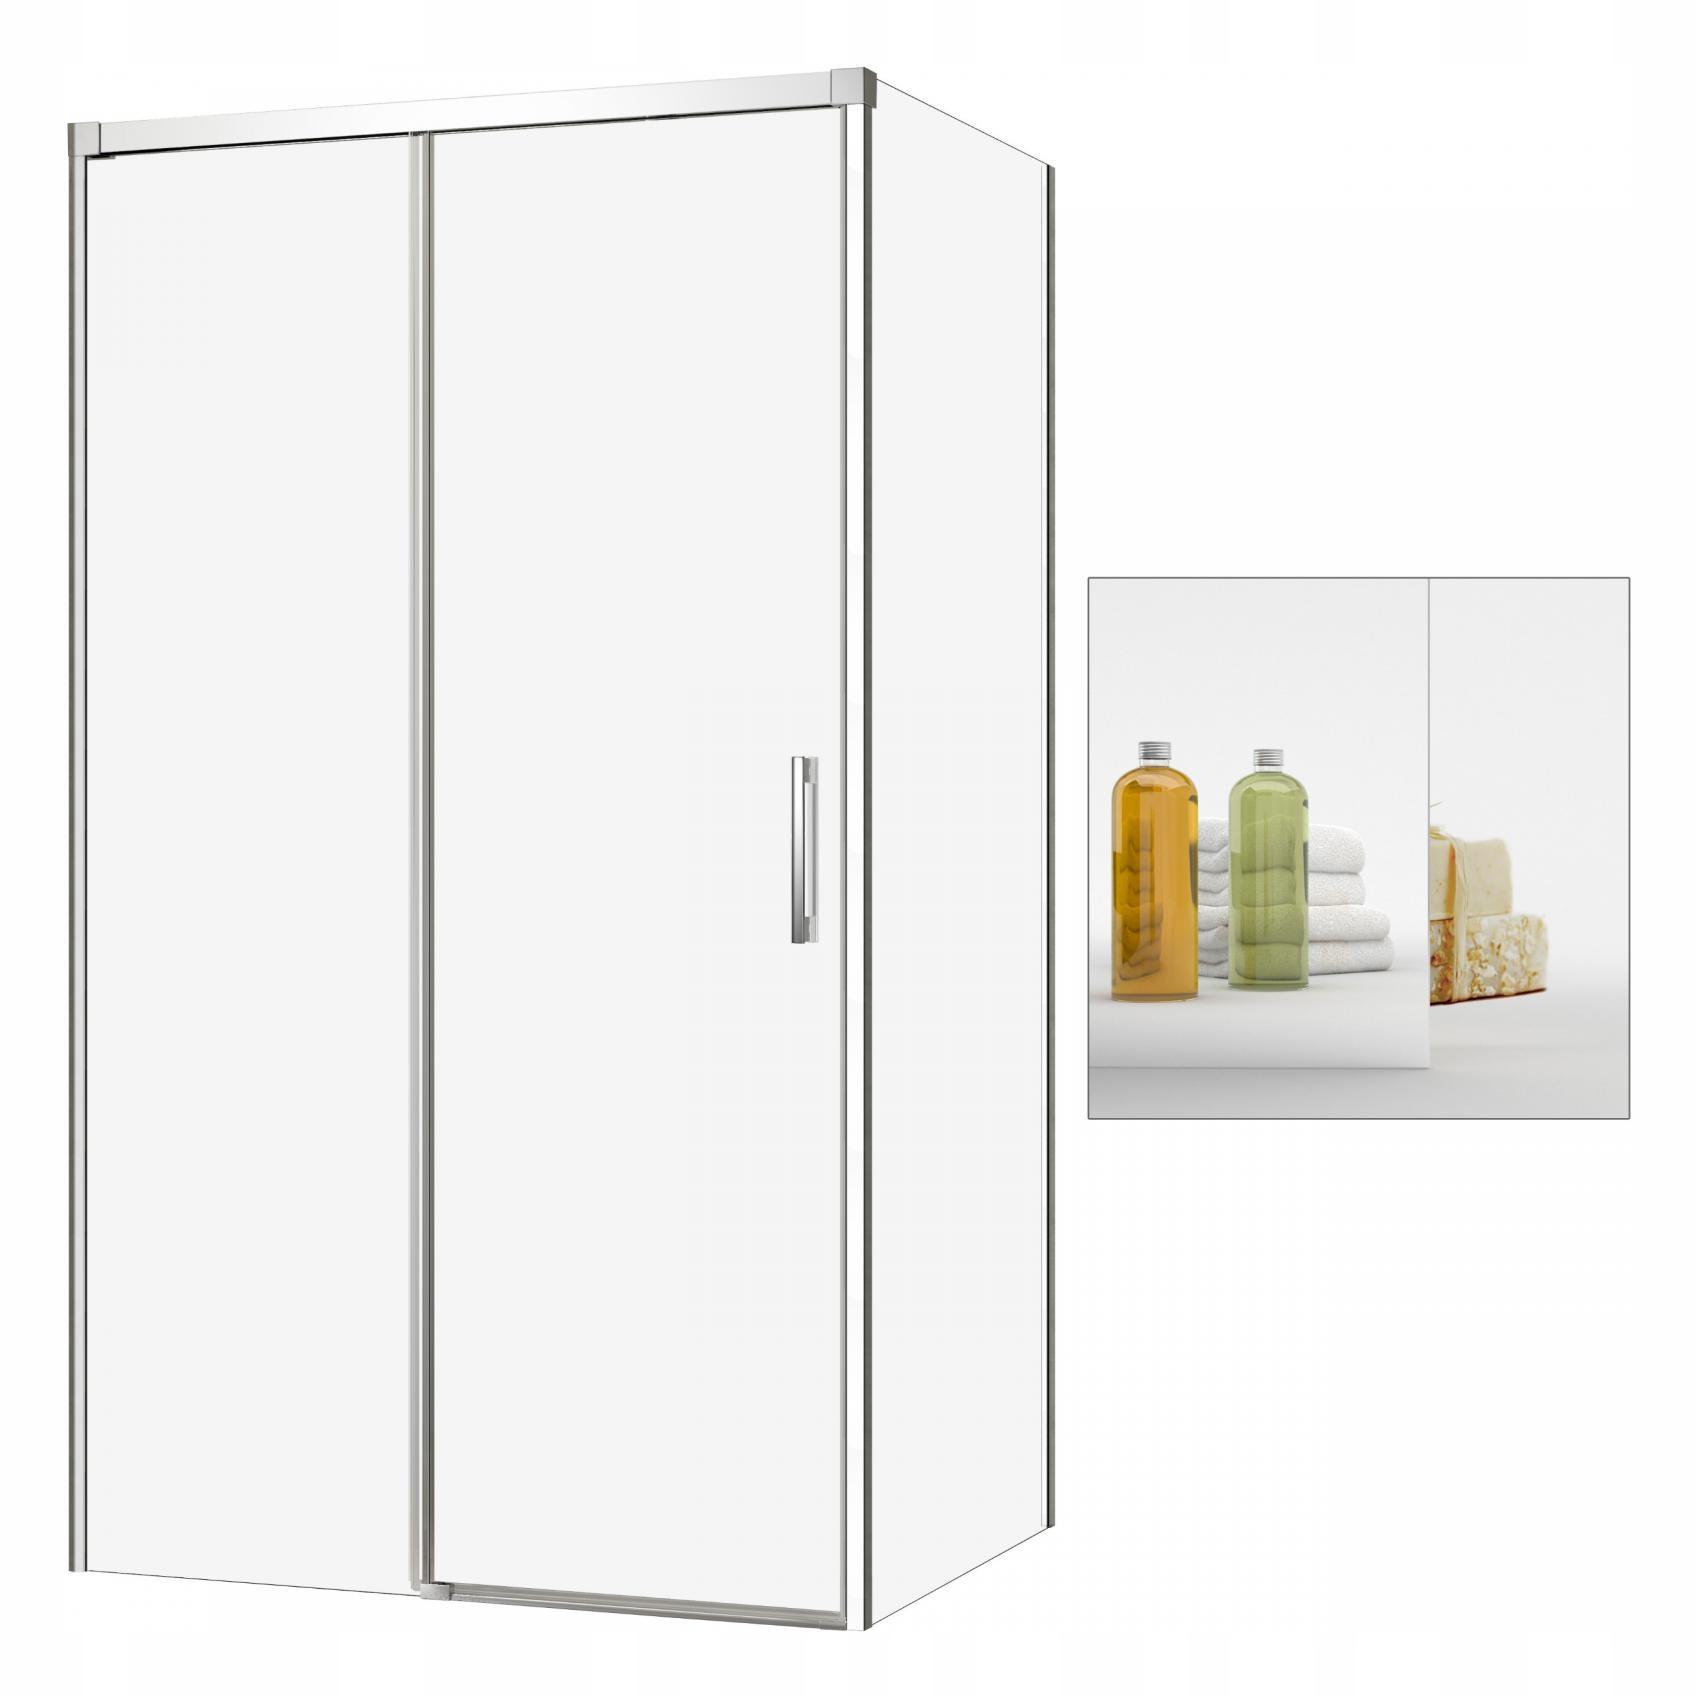 Sprcha 140x110 L Nápad KDJ sklo zrkadla